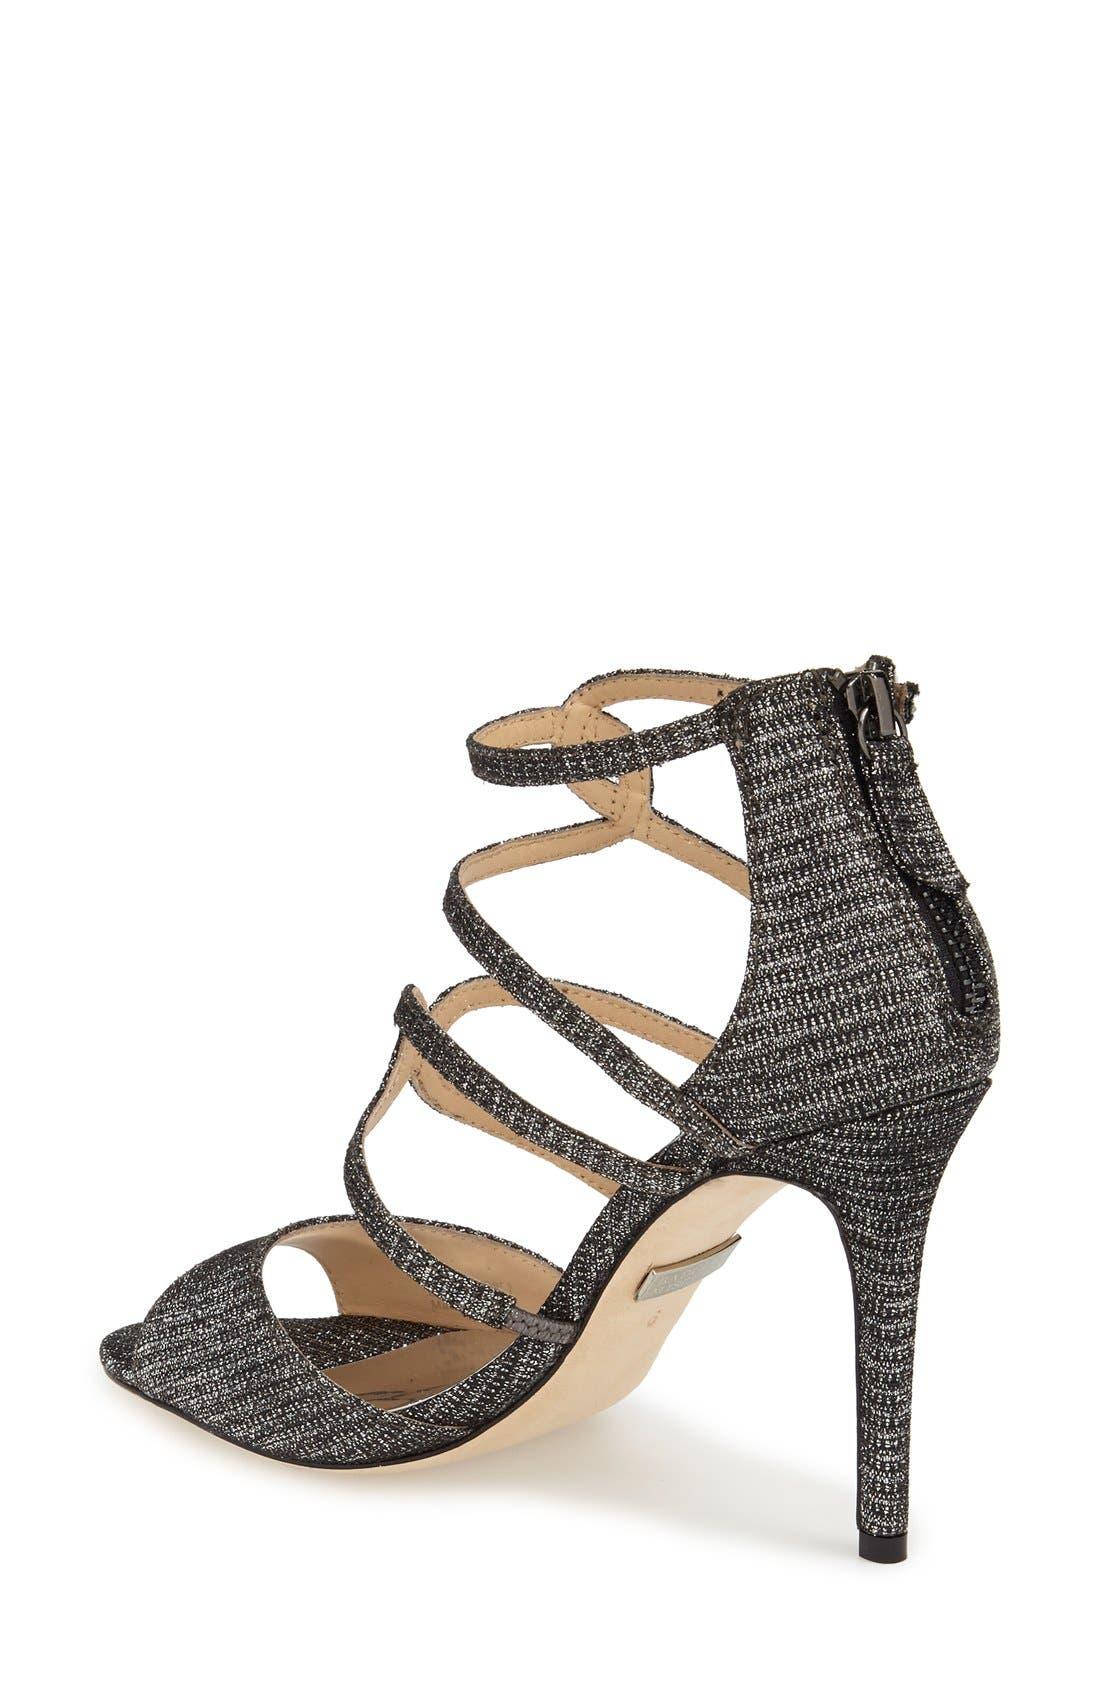 Alternate Image 2  - Badgley Mischka 'Devon' Strappy Sandal (Women)